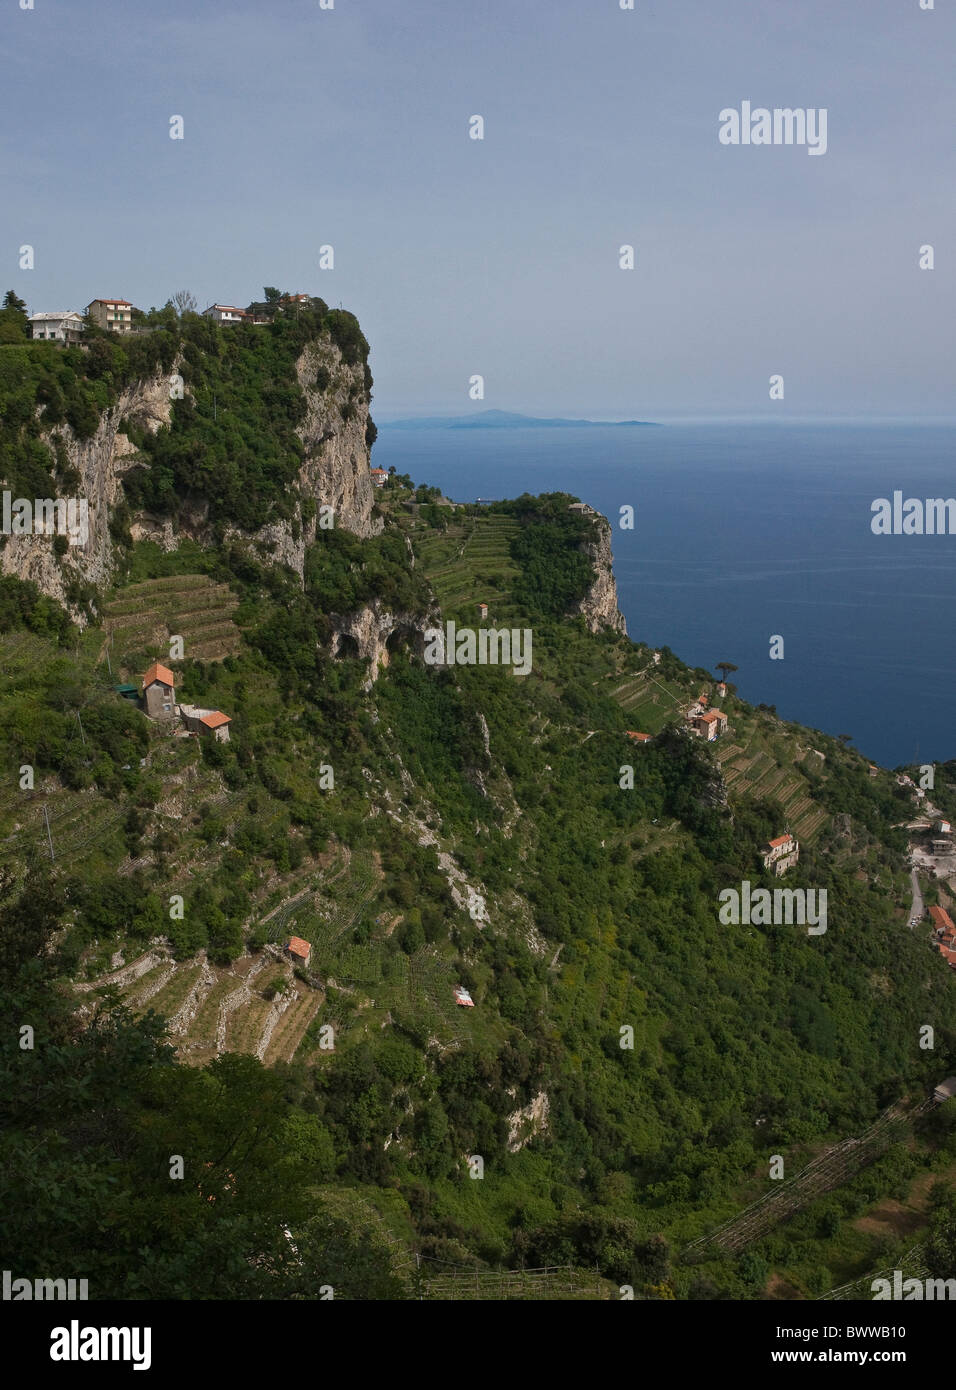 Italy Europe Colle La Selle Bomerano Amalfi coast Campania region spring sea coast mountains Mediterranean - Stock Image